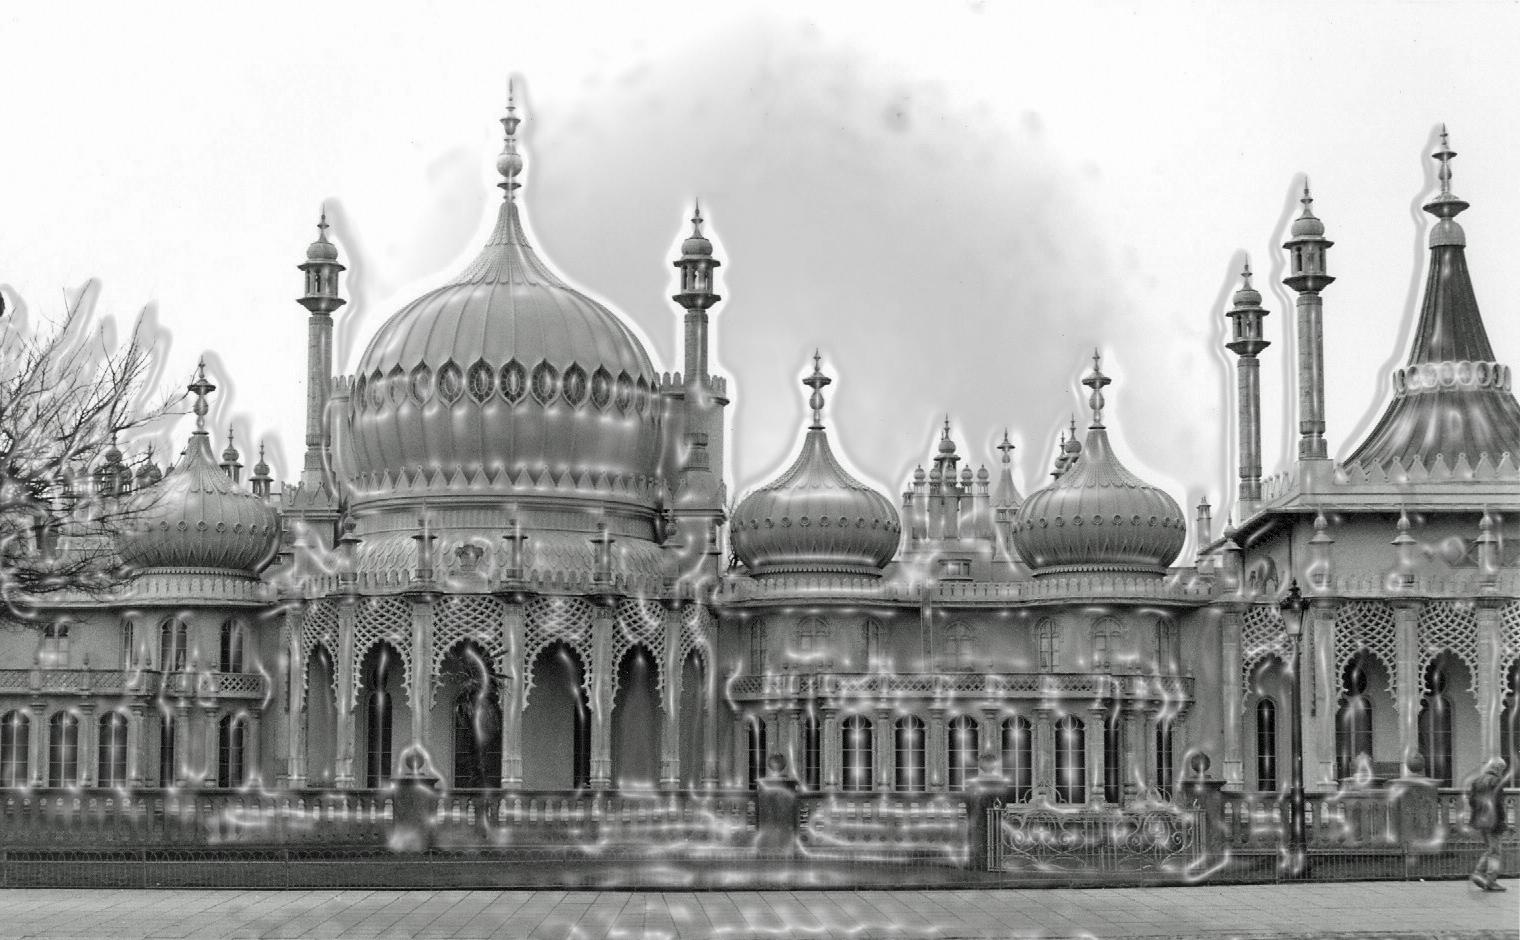 31103 || 4983 || Brighton Pavilion Iced